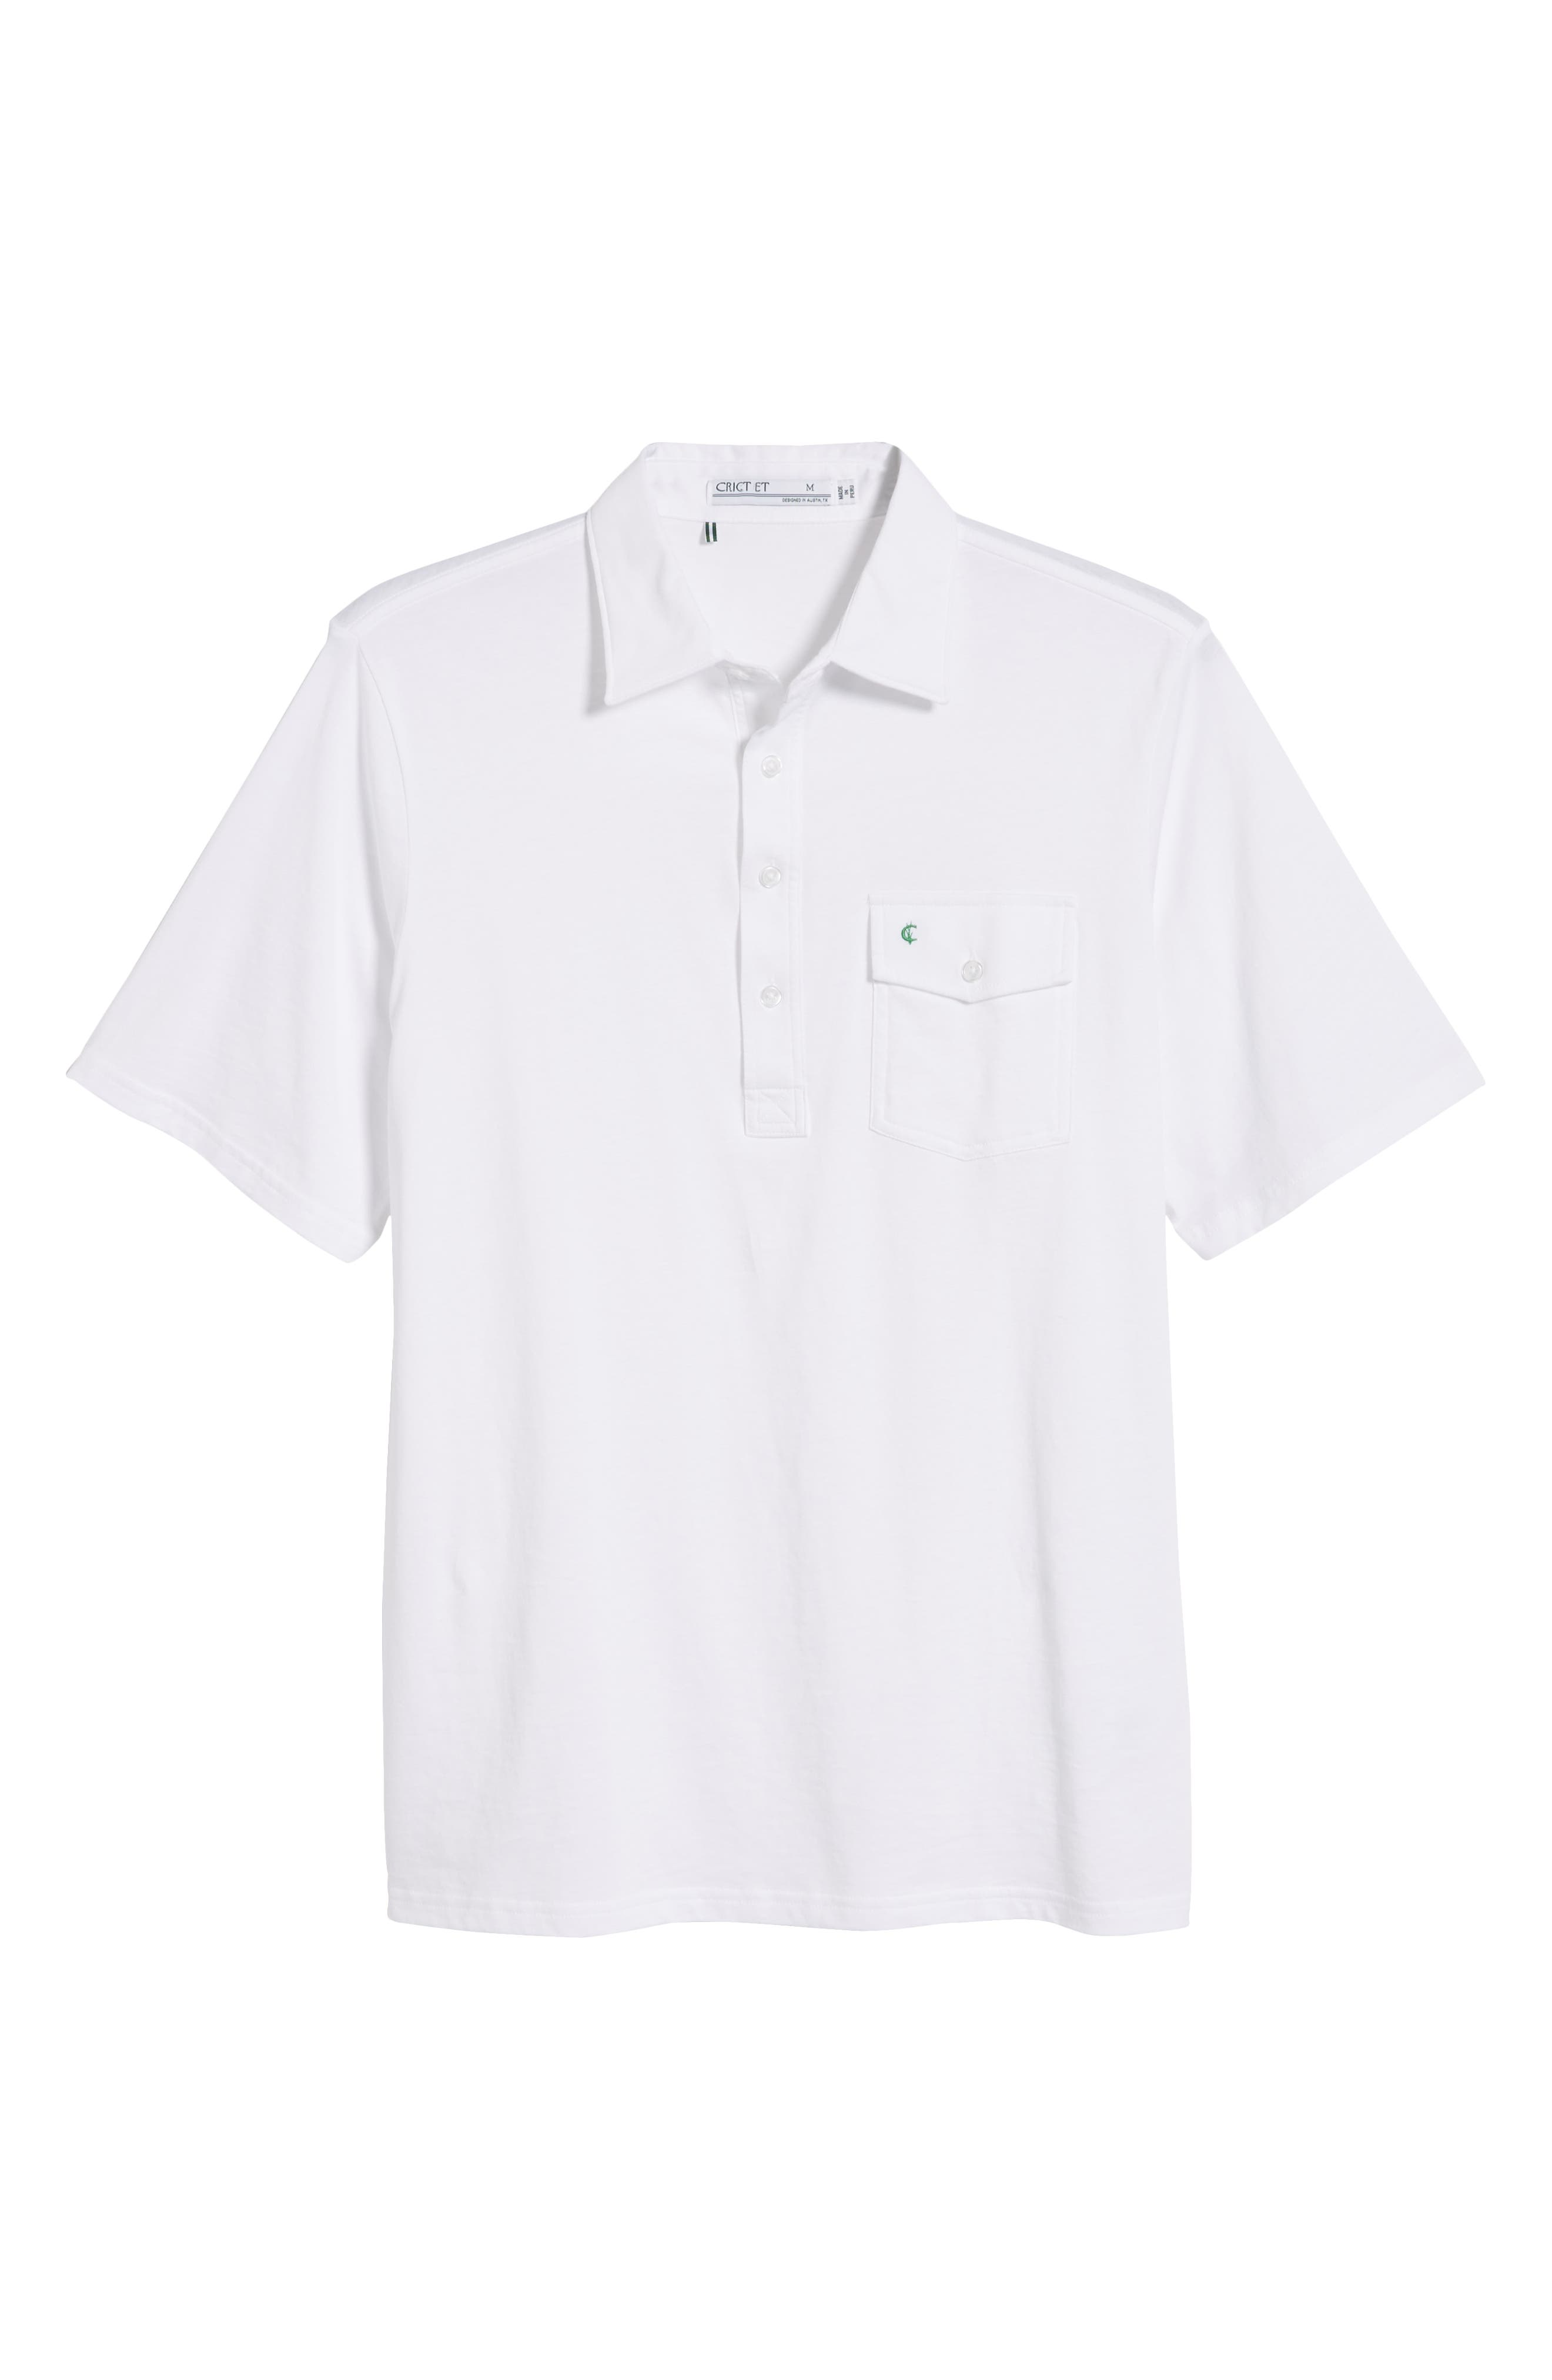 CRIQUET, Regular Fit Players Jersey Polo, Alternate thumbnail 6, color, WHITE